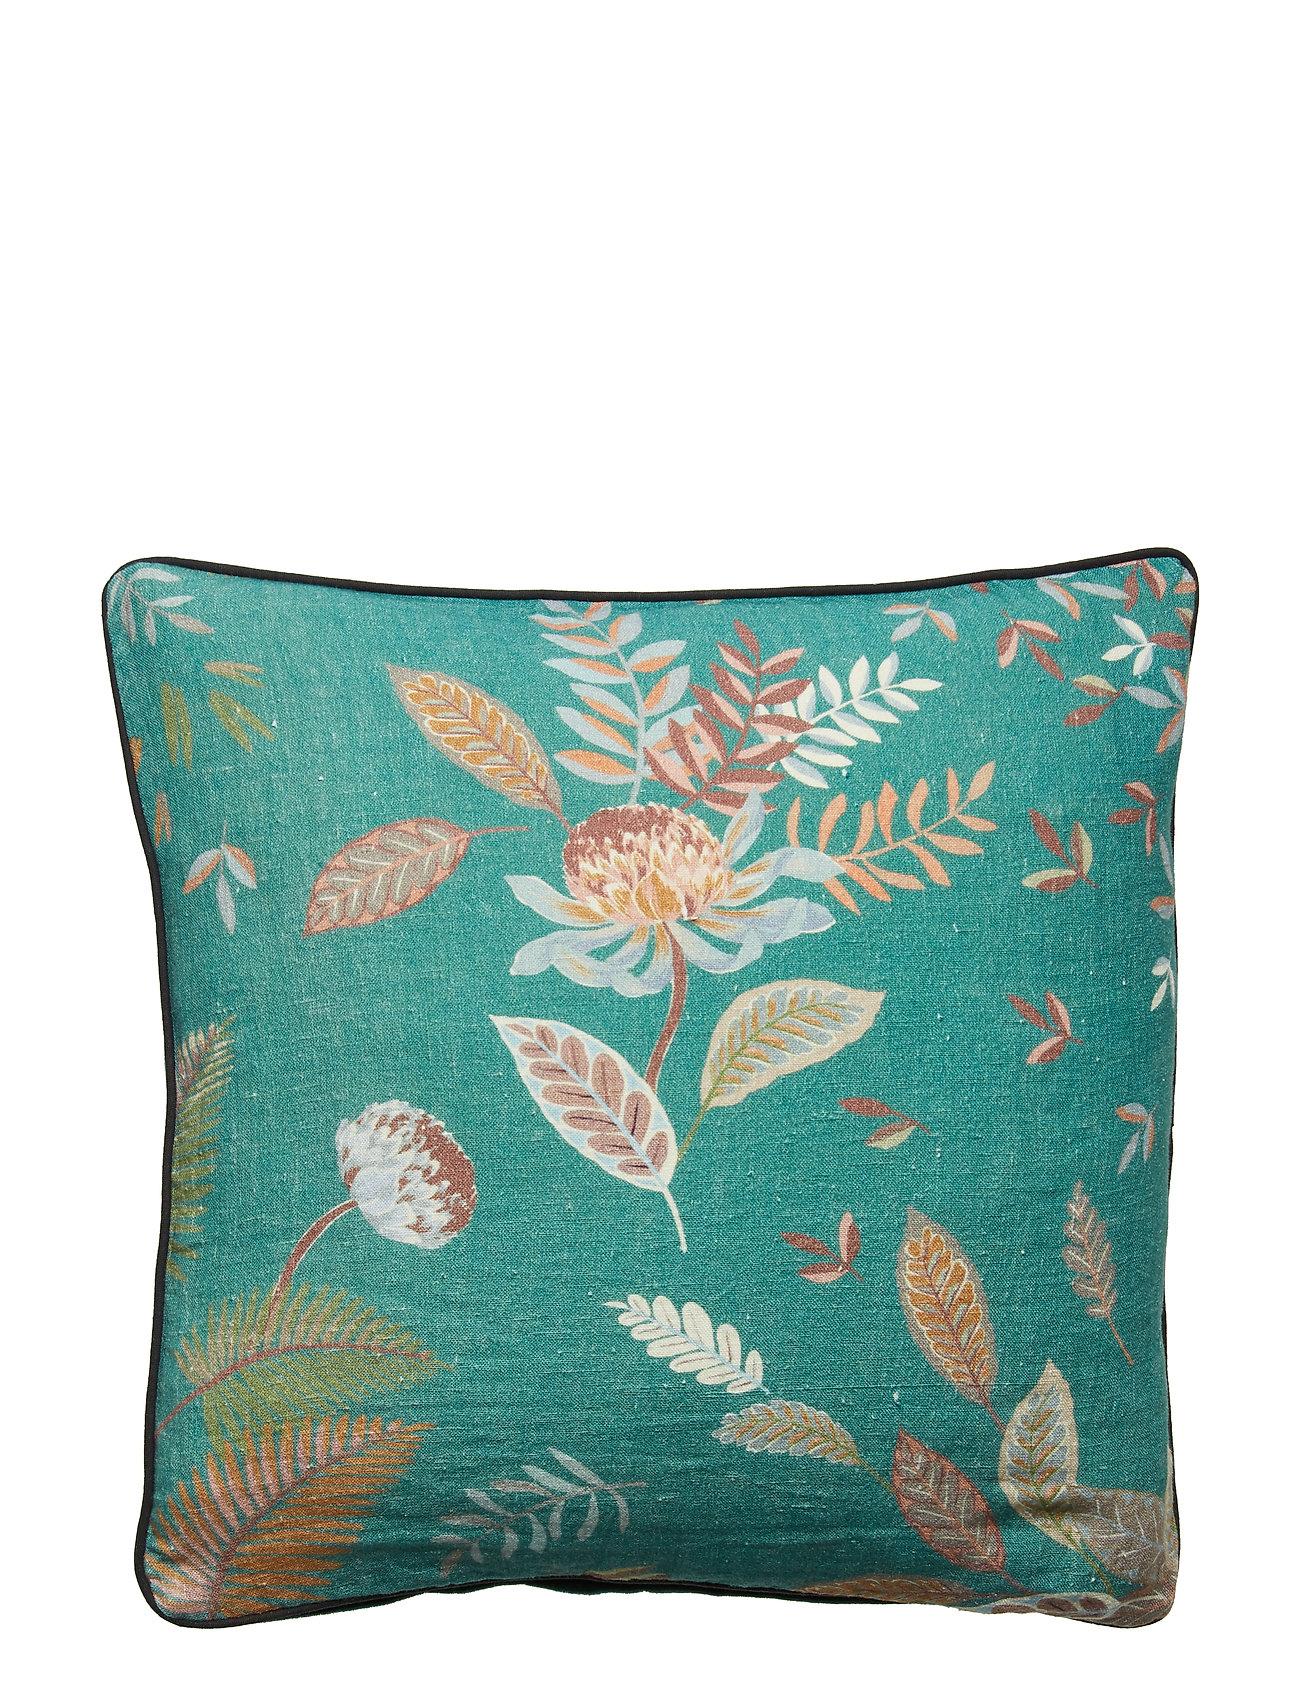 Botanica Cushion CoverdeepHome Cushion CoverdeepHome Day CoverdeepHome Botanica Cushion Day Day Botanica 34jcAqR5L